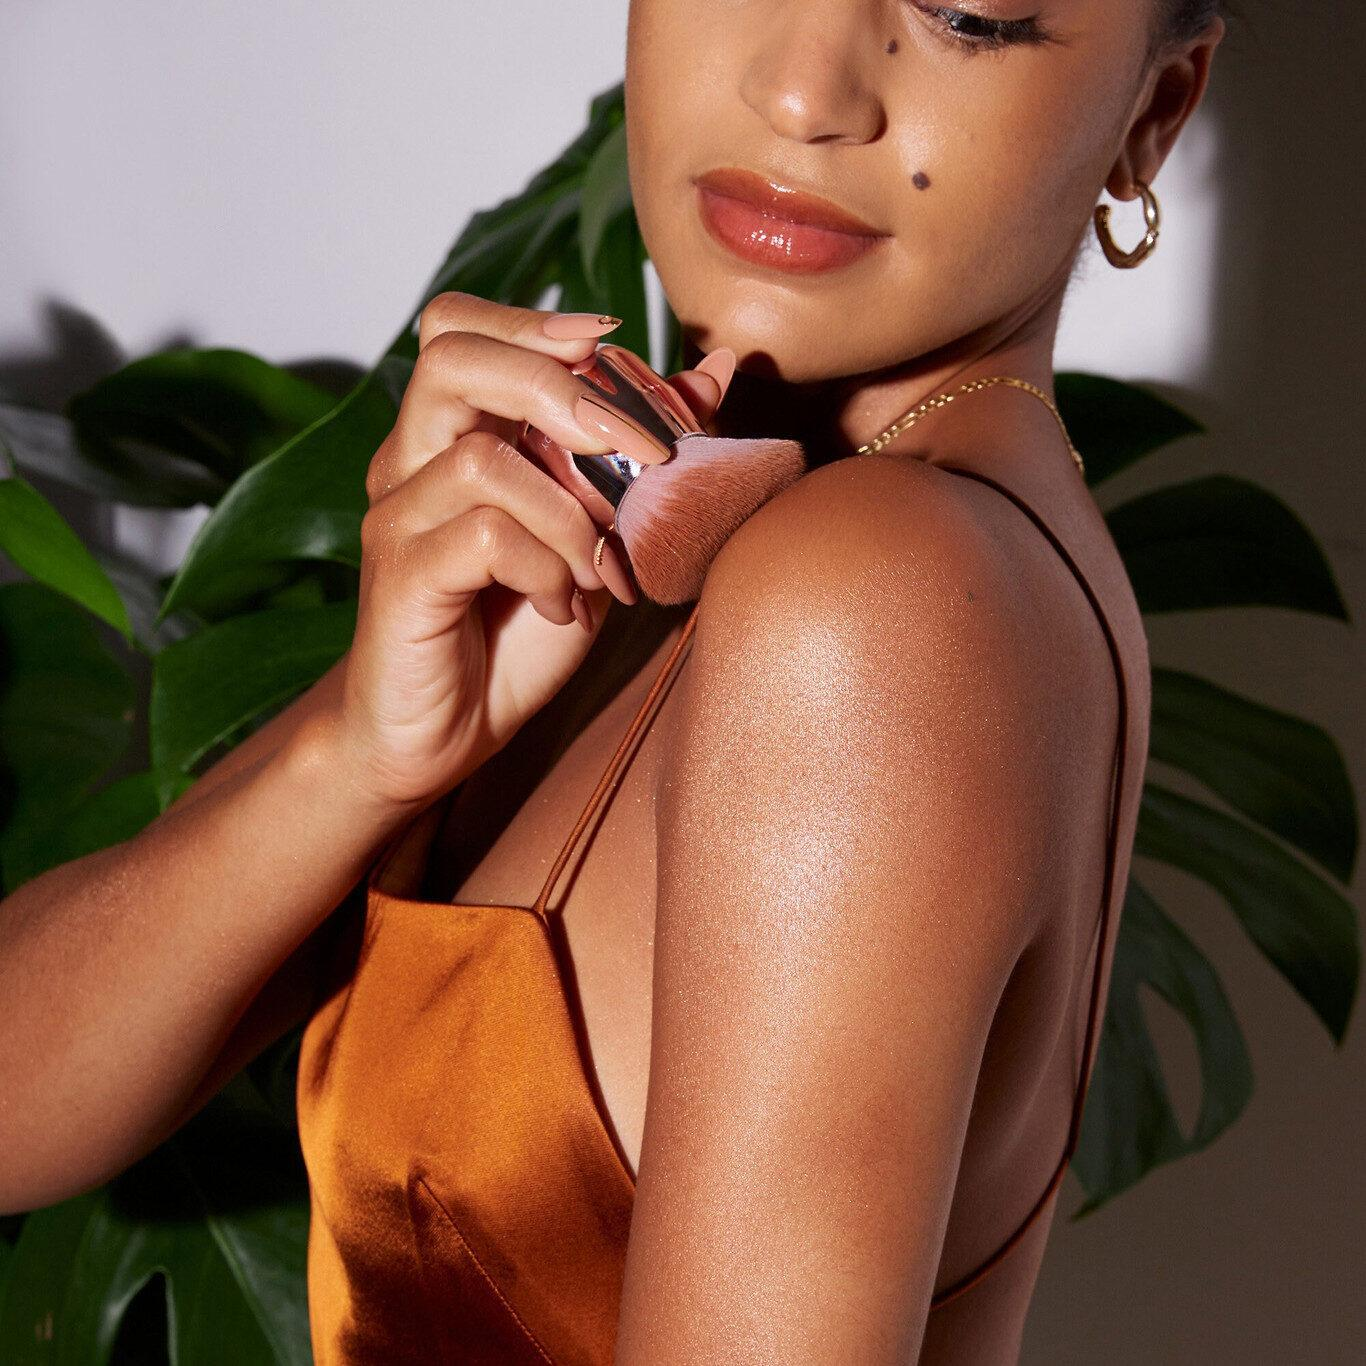 Fenty Beauty Body Sauce Body Luminizing Tint Model Promo Medium